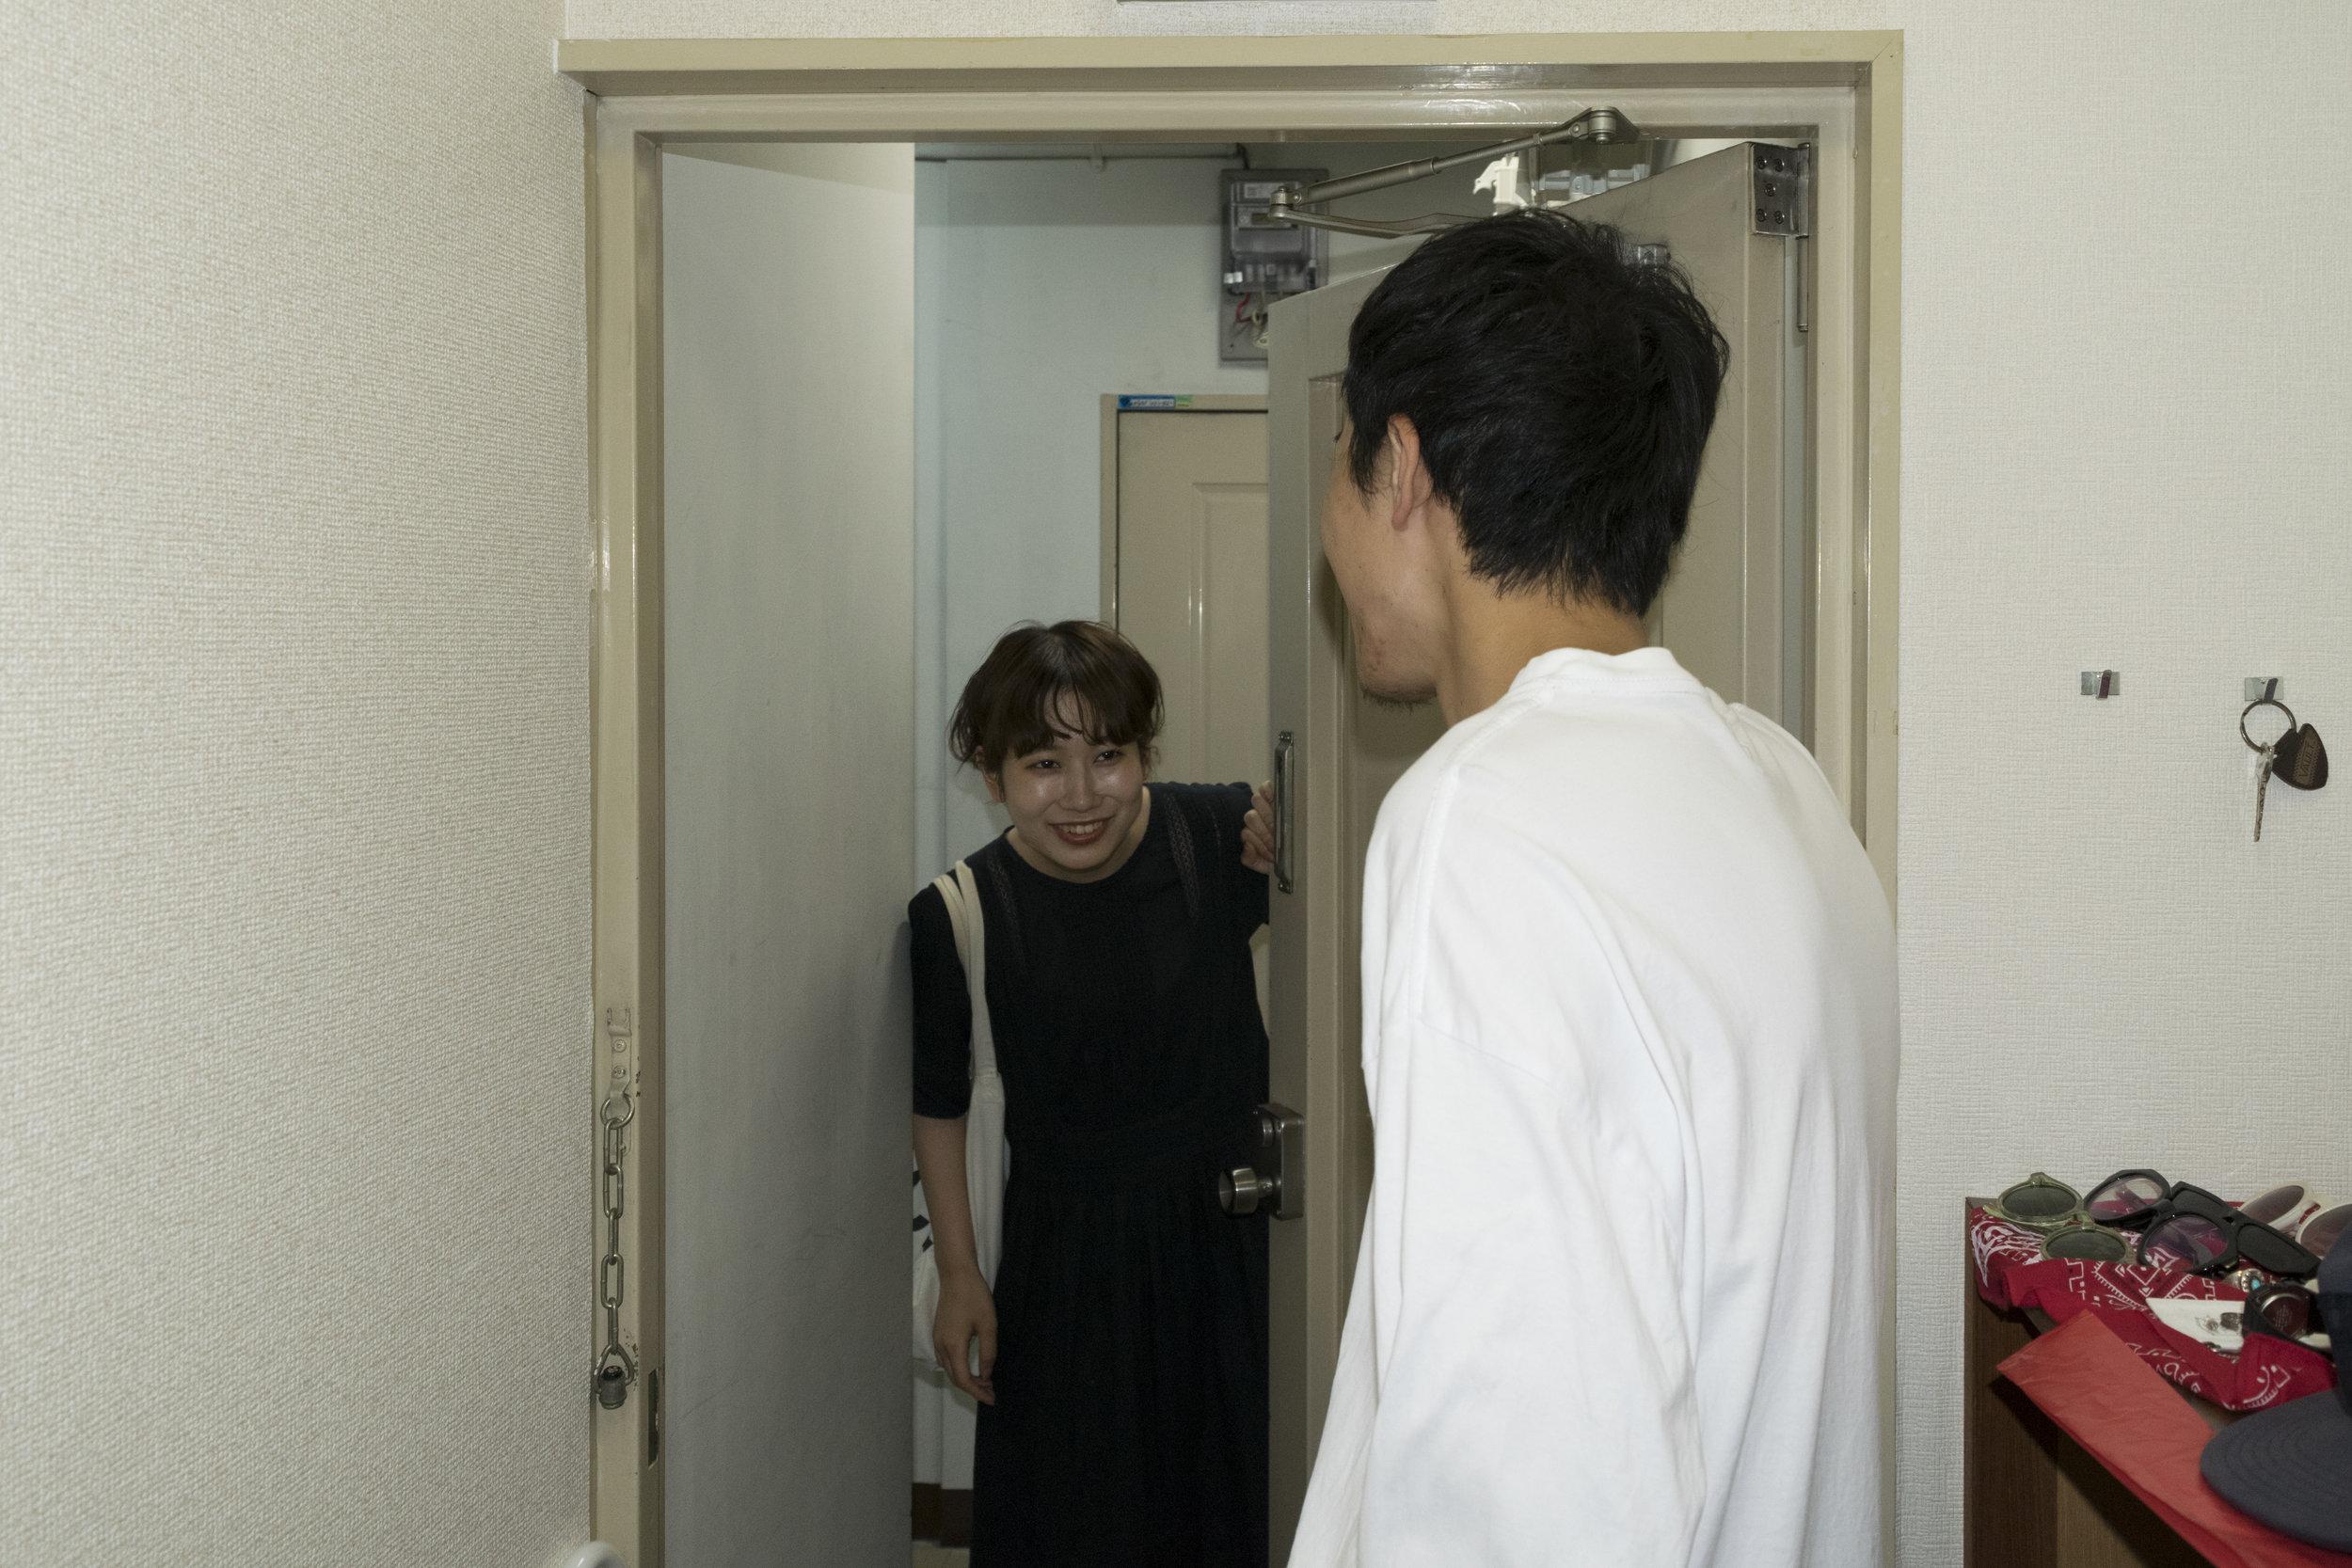 180821_Mitsuo_room-112.jpg